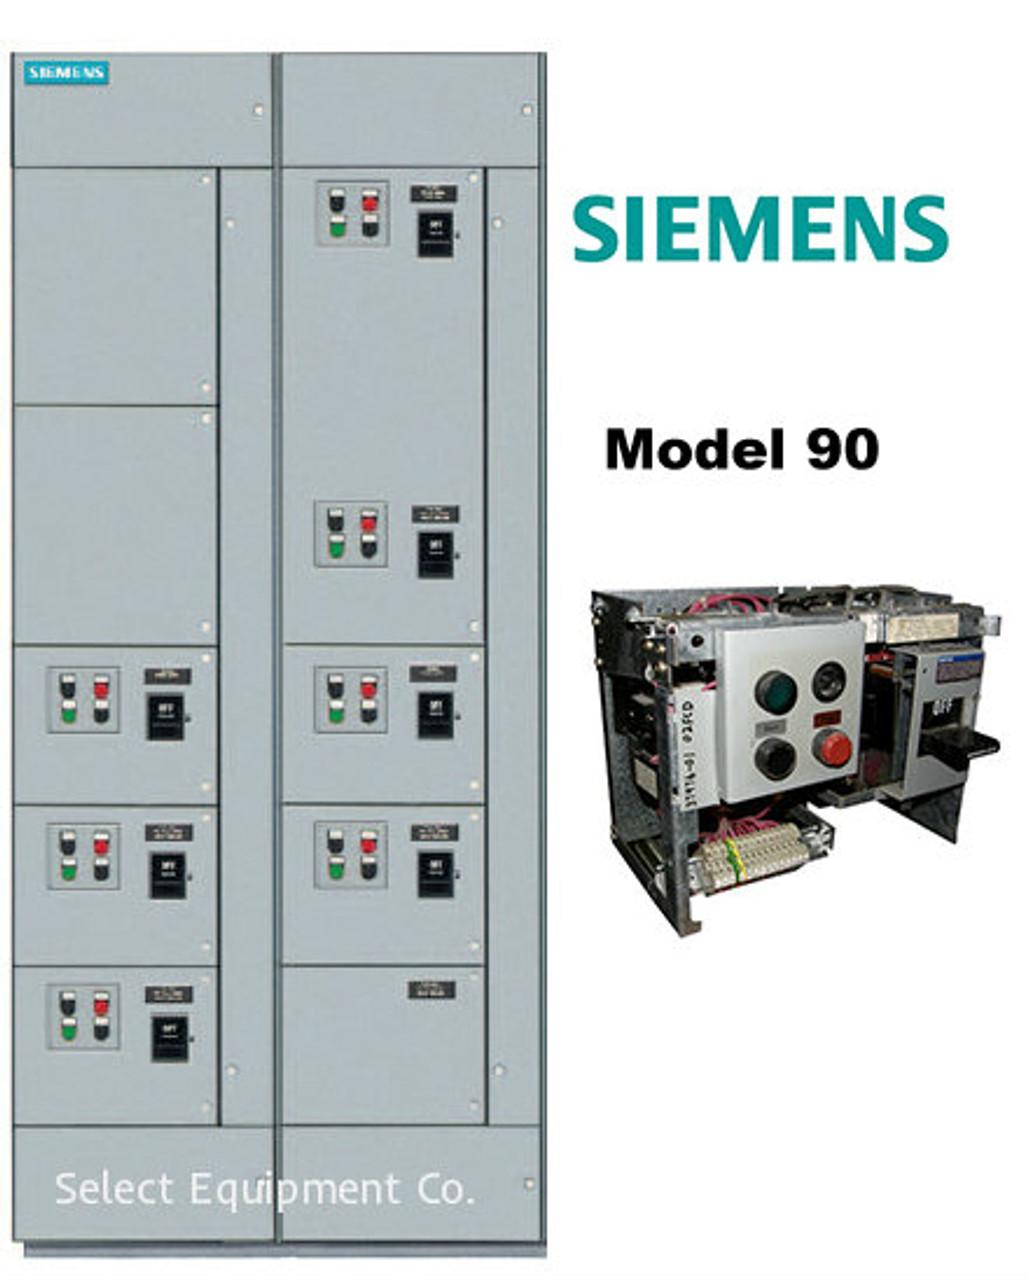 Siemens Model 90 MCC Buckets & Motor Control Centers